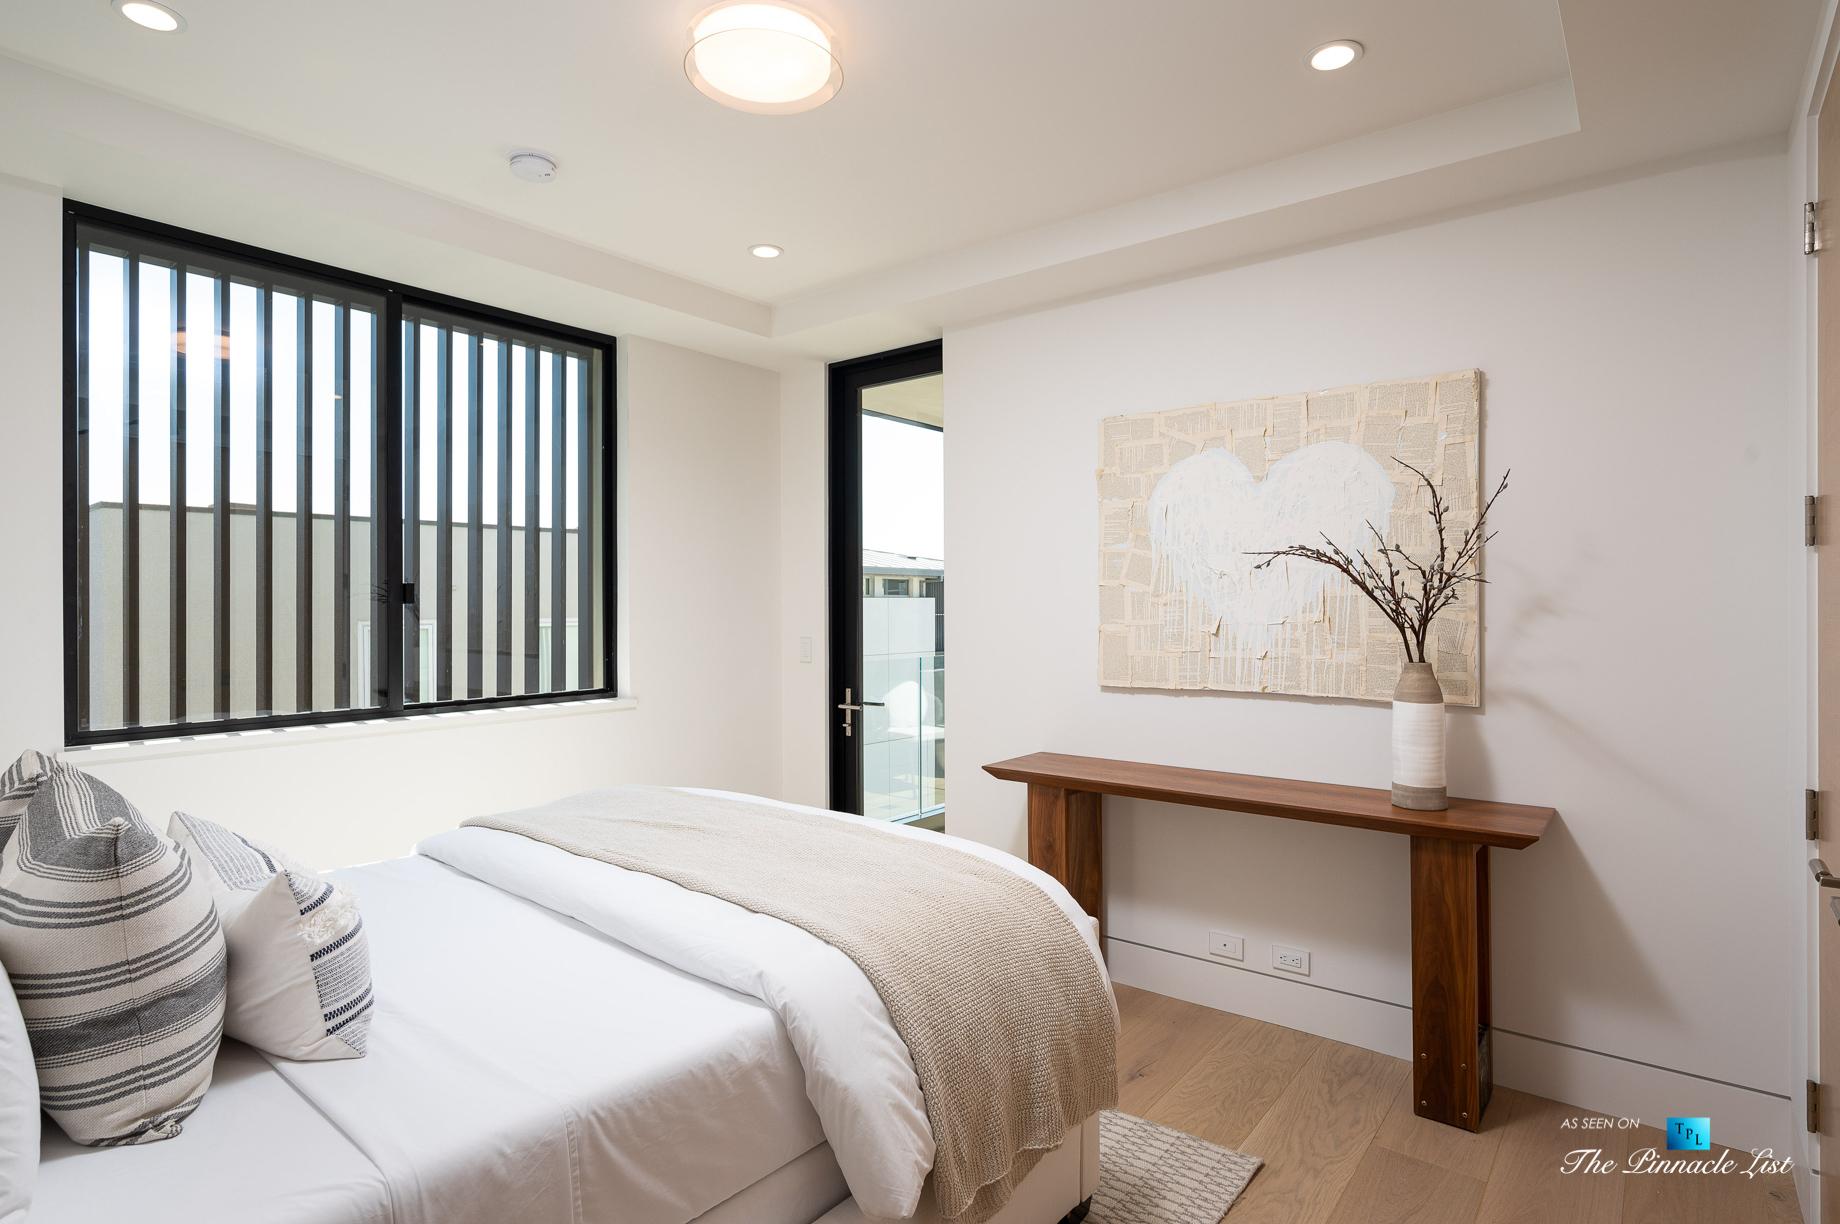 2016 Ocean Dr, Manhattan Beach, CA, USA – Bedroom – Luxury Real Estate – Modern Ocean View Home